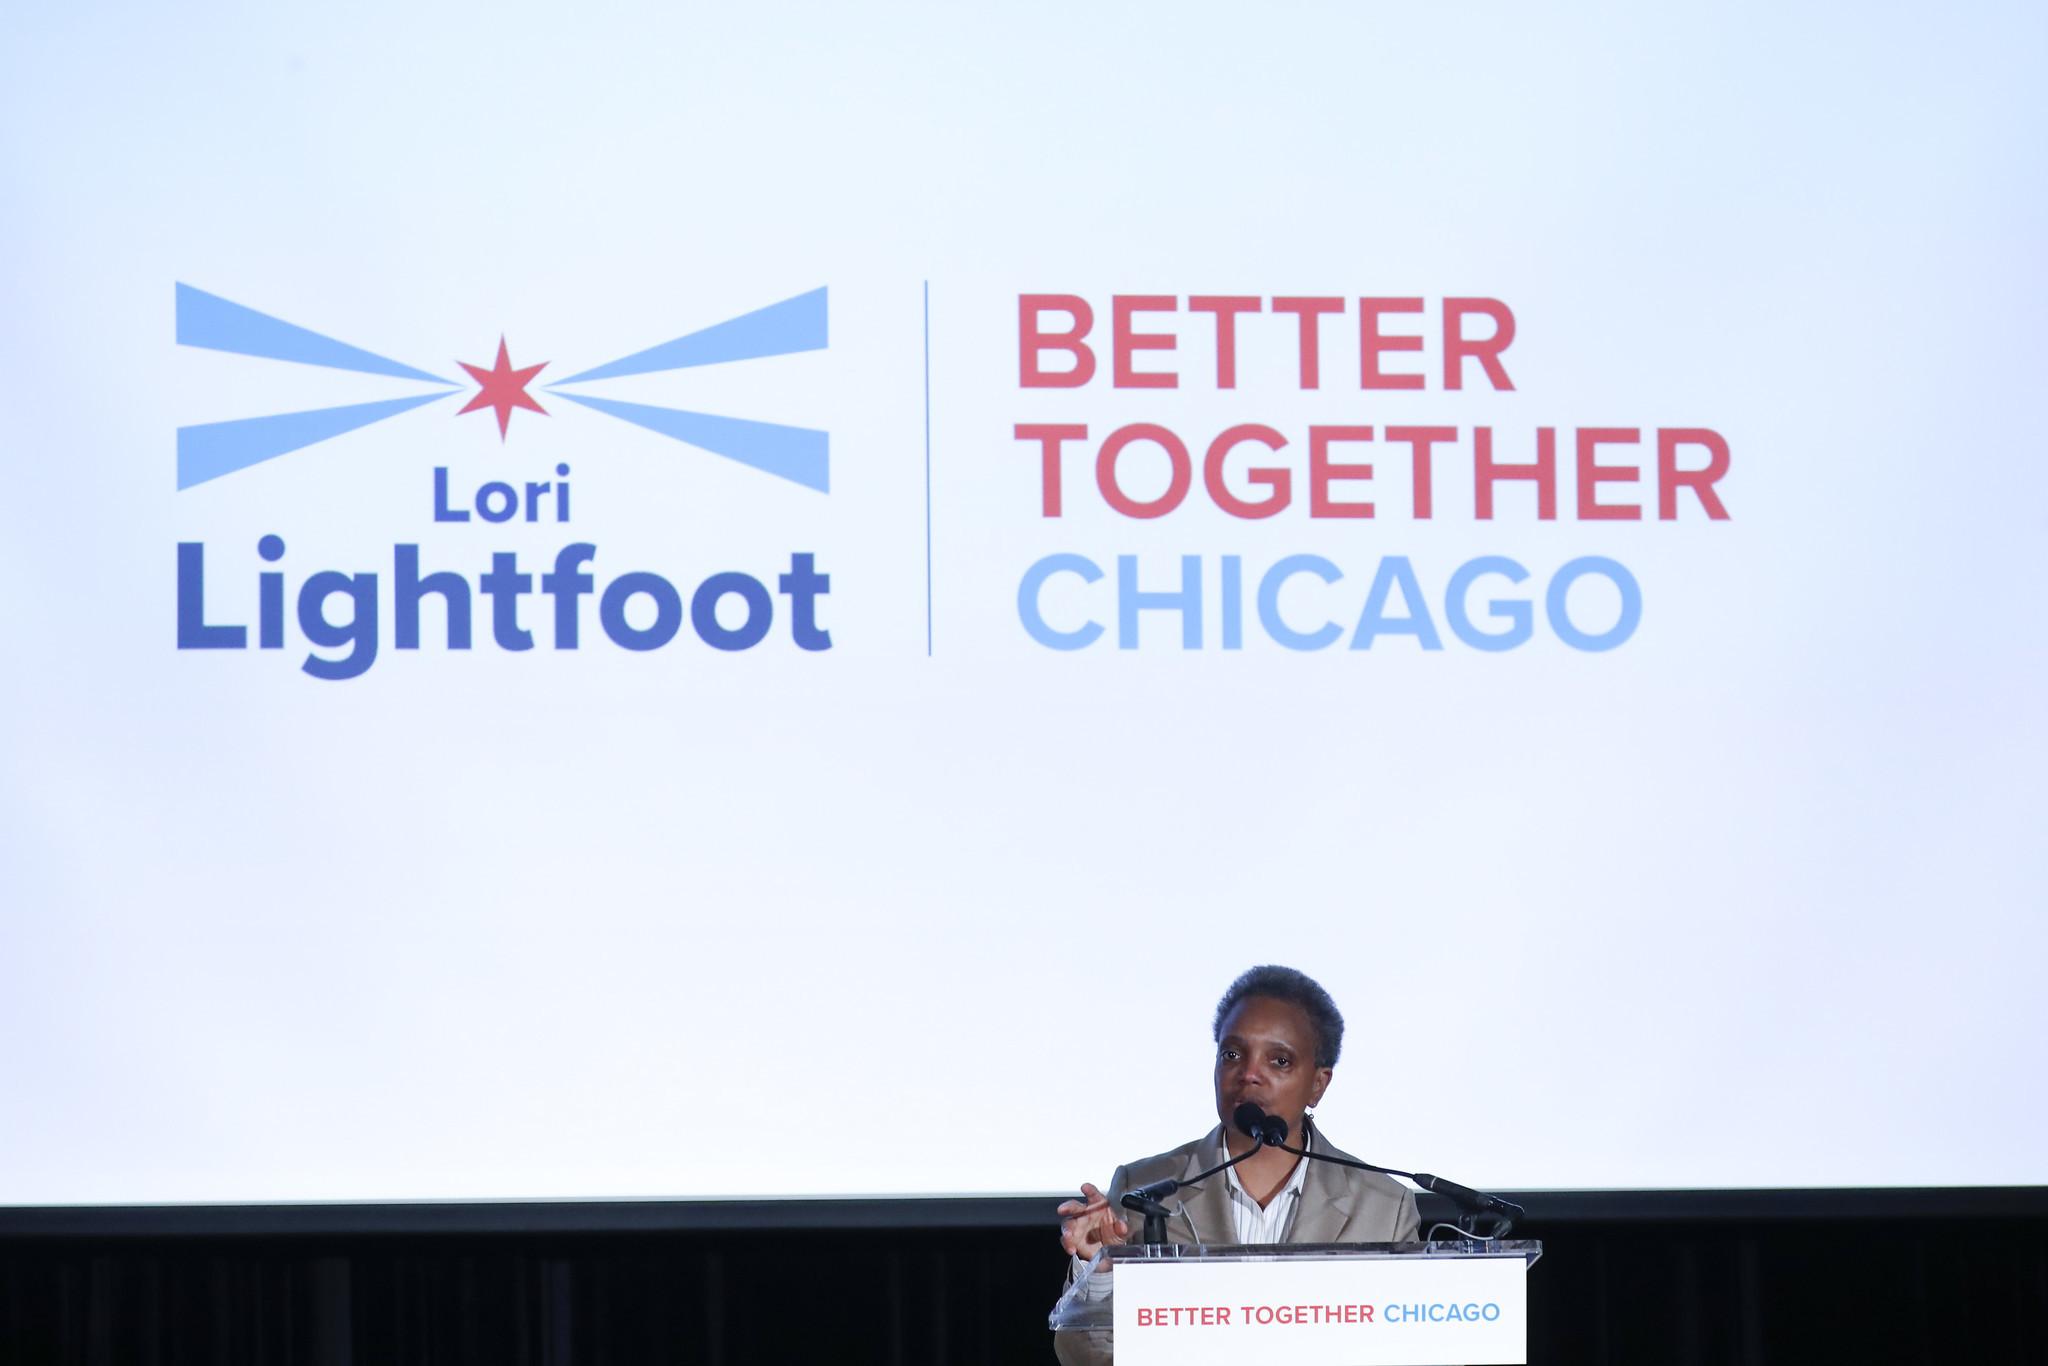 Lori Lightfoot's top 4 priorities as Chicago's new mayor